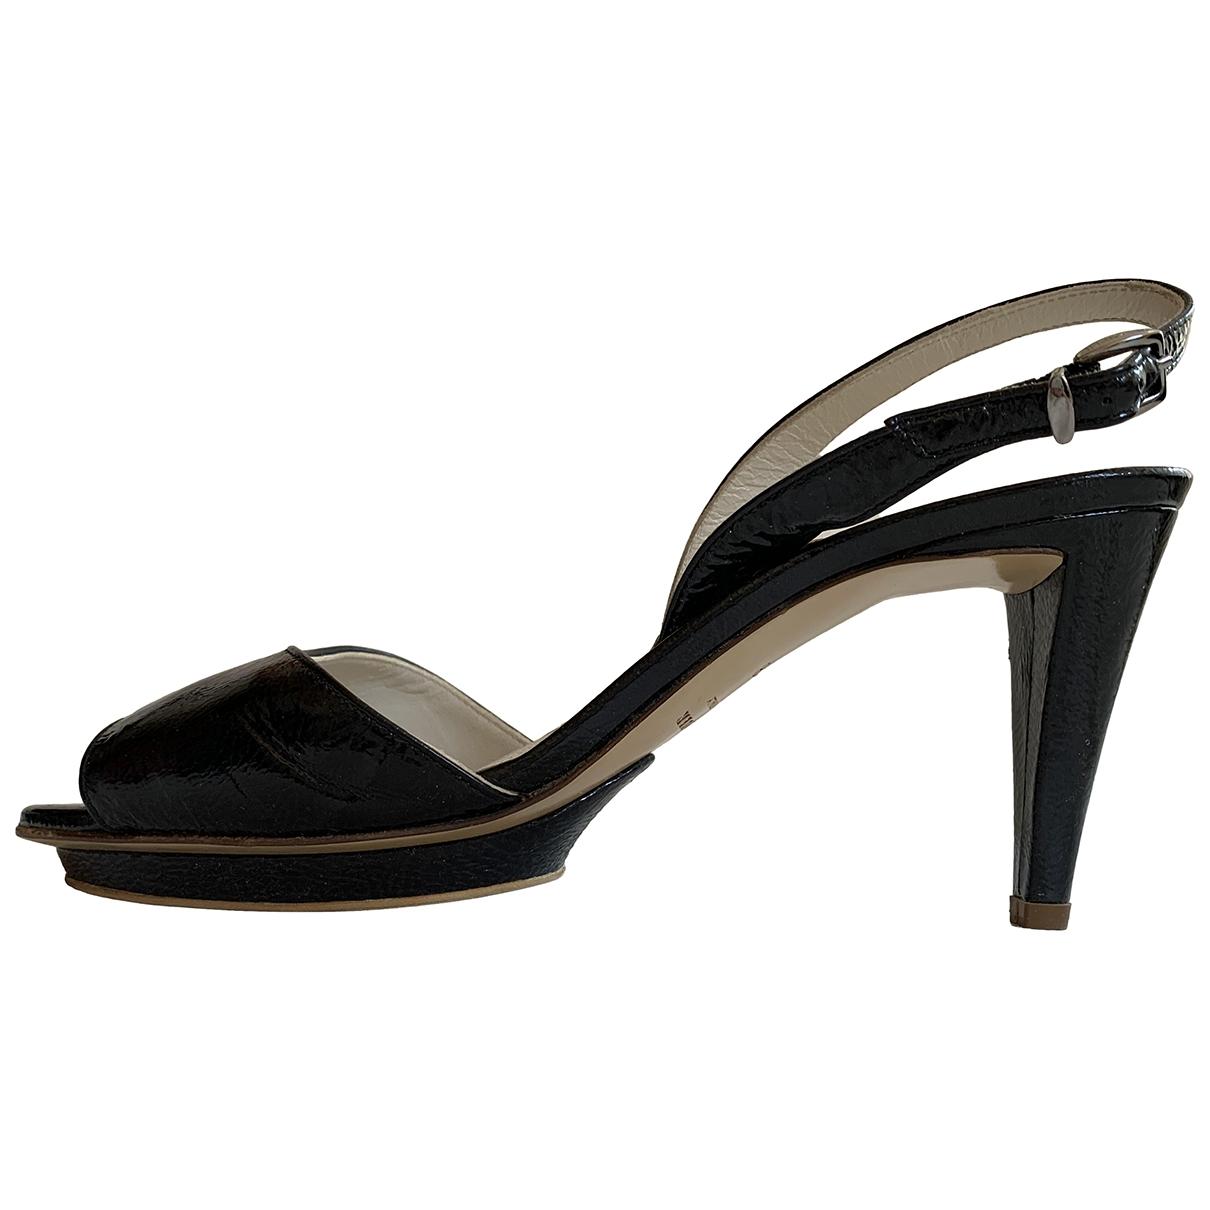 Jil Sander \N Black Patent leather Sandals for Women 38 EU